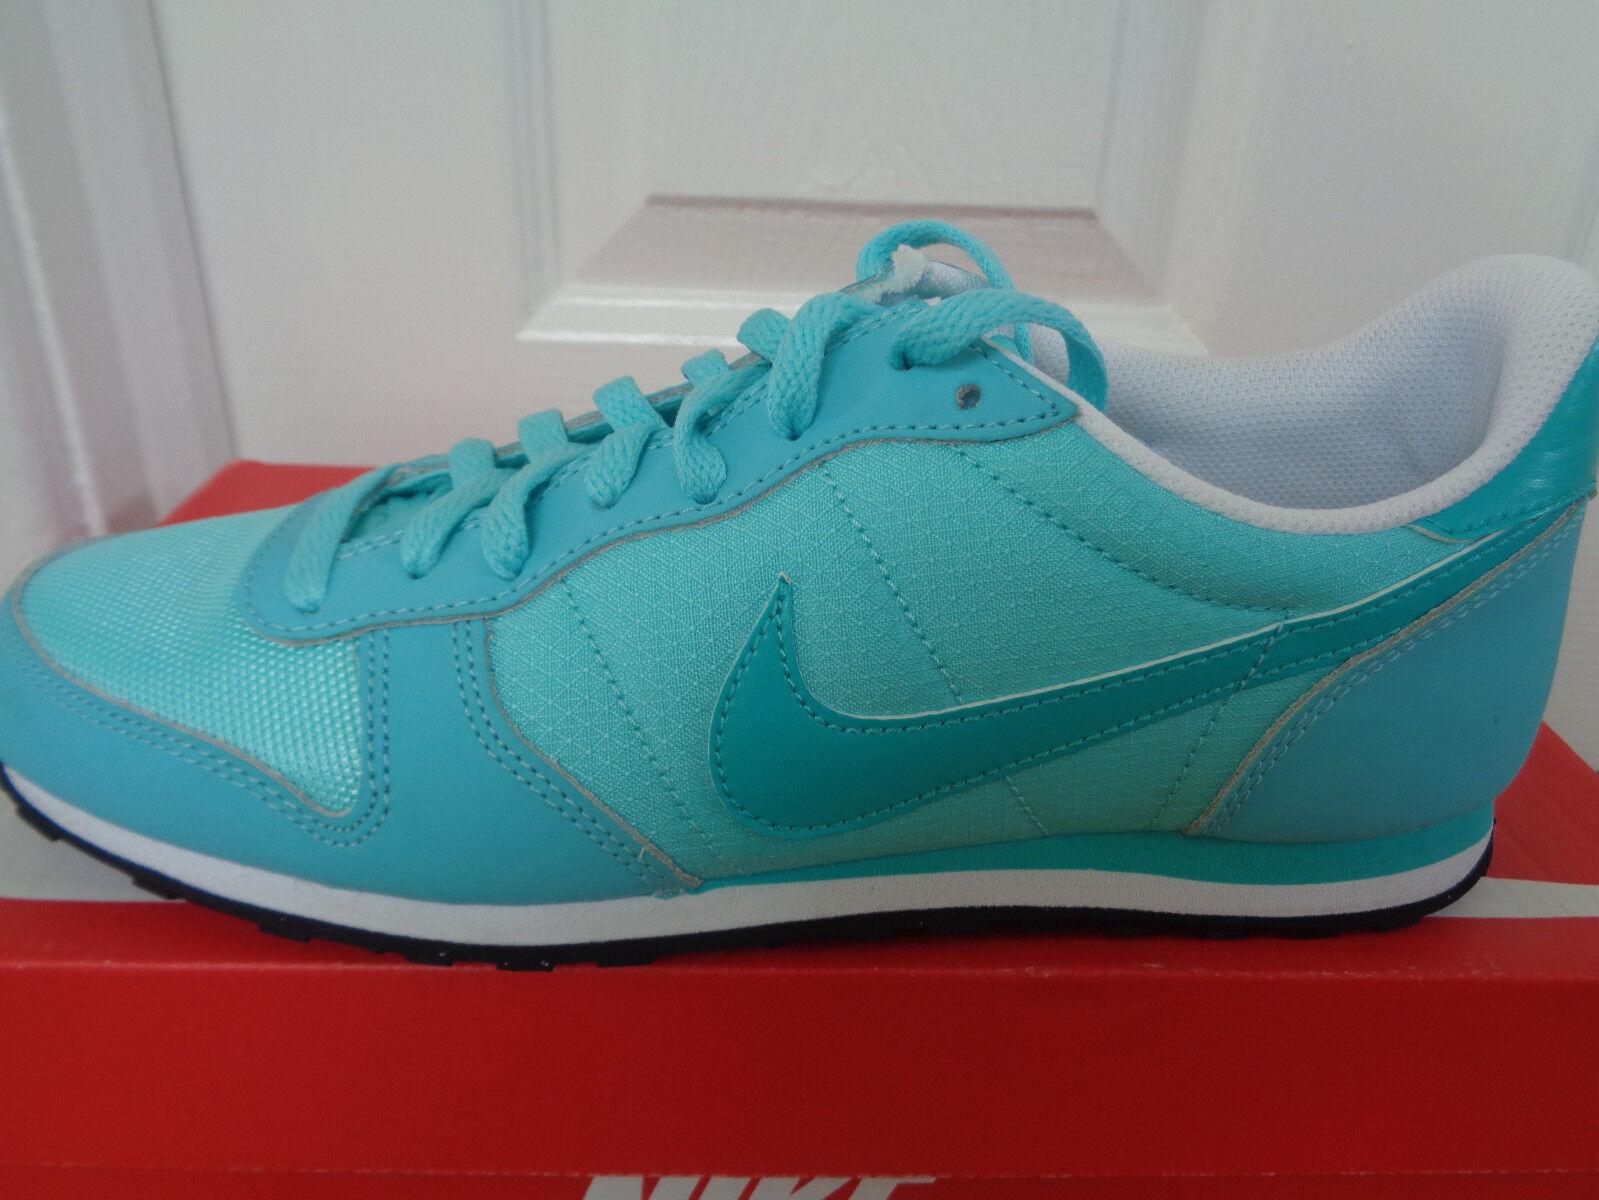 Nike Genico femmes trainers chaussures 644451 301 uk 4.5 eu 38 us 7 NEW+BOX